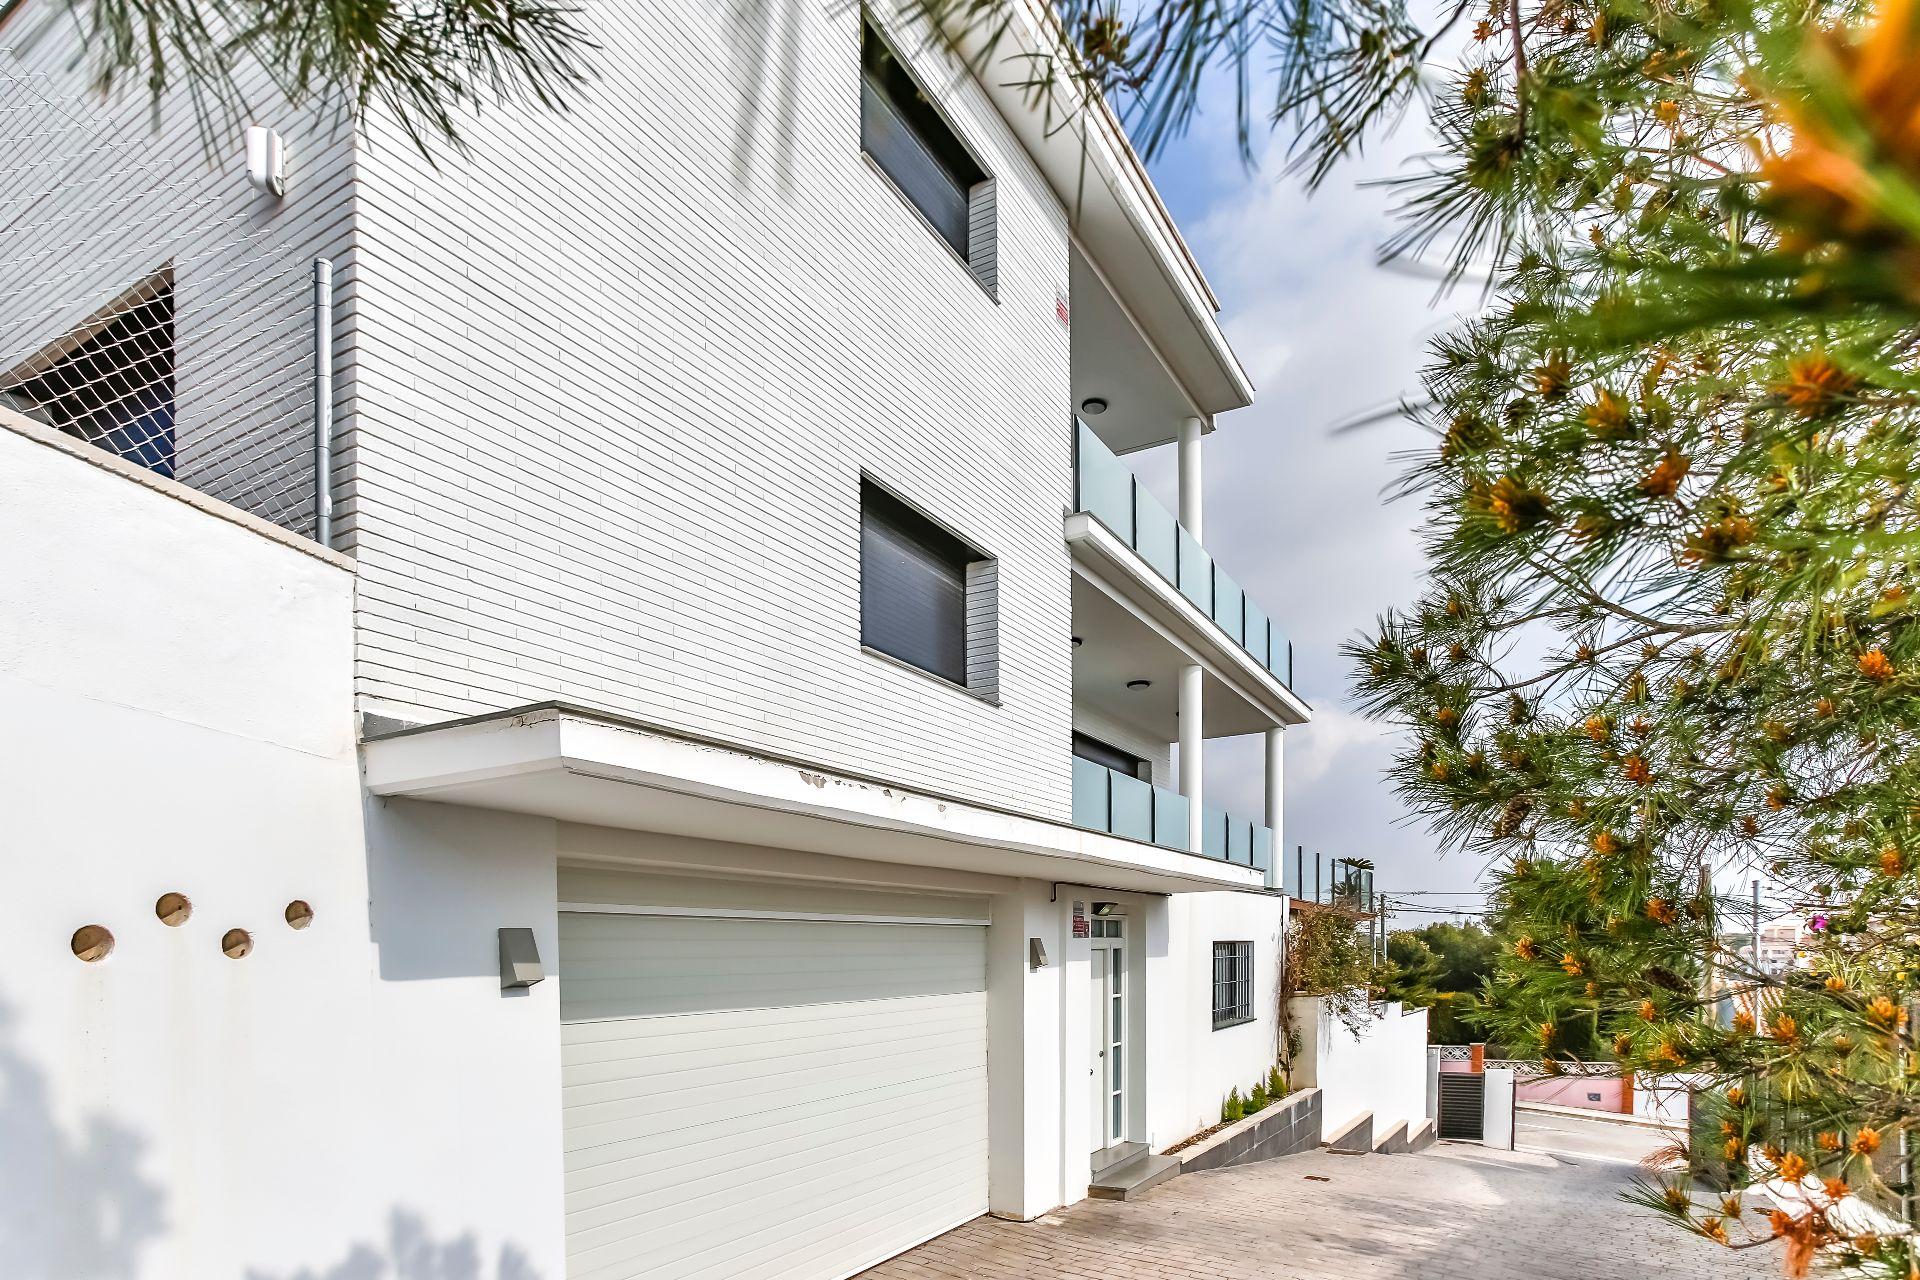 Casa / Chalet en Calafell, Segur de Dalt, venta